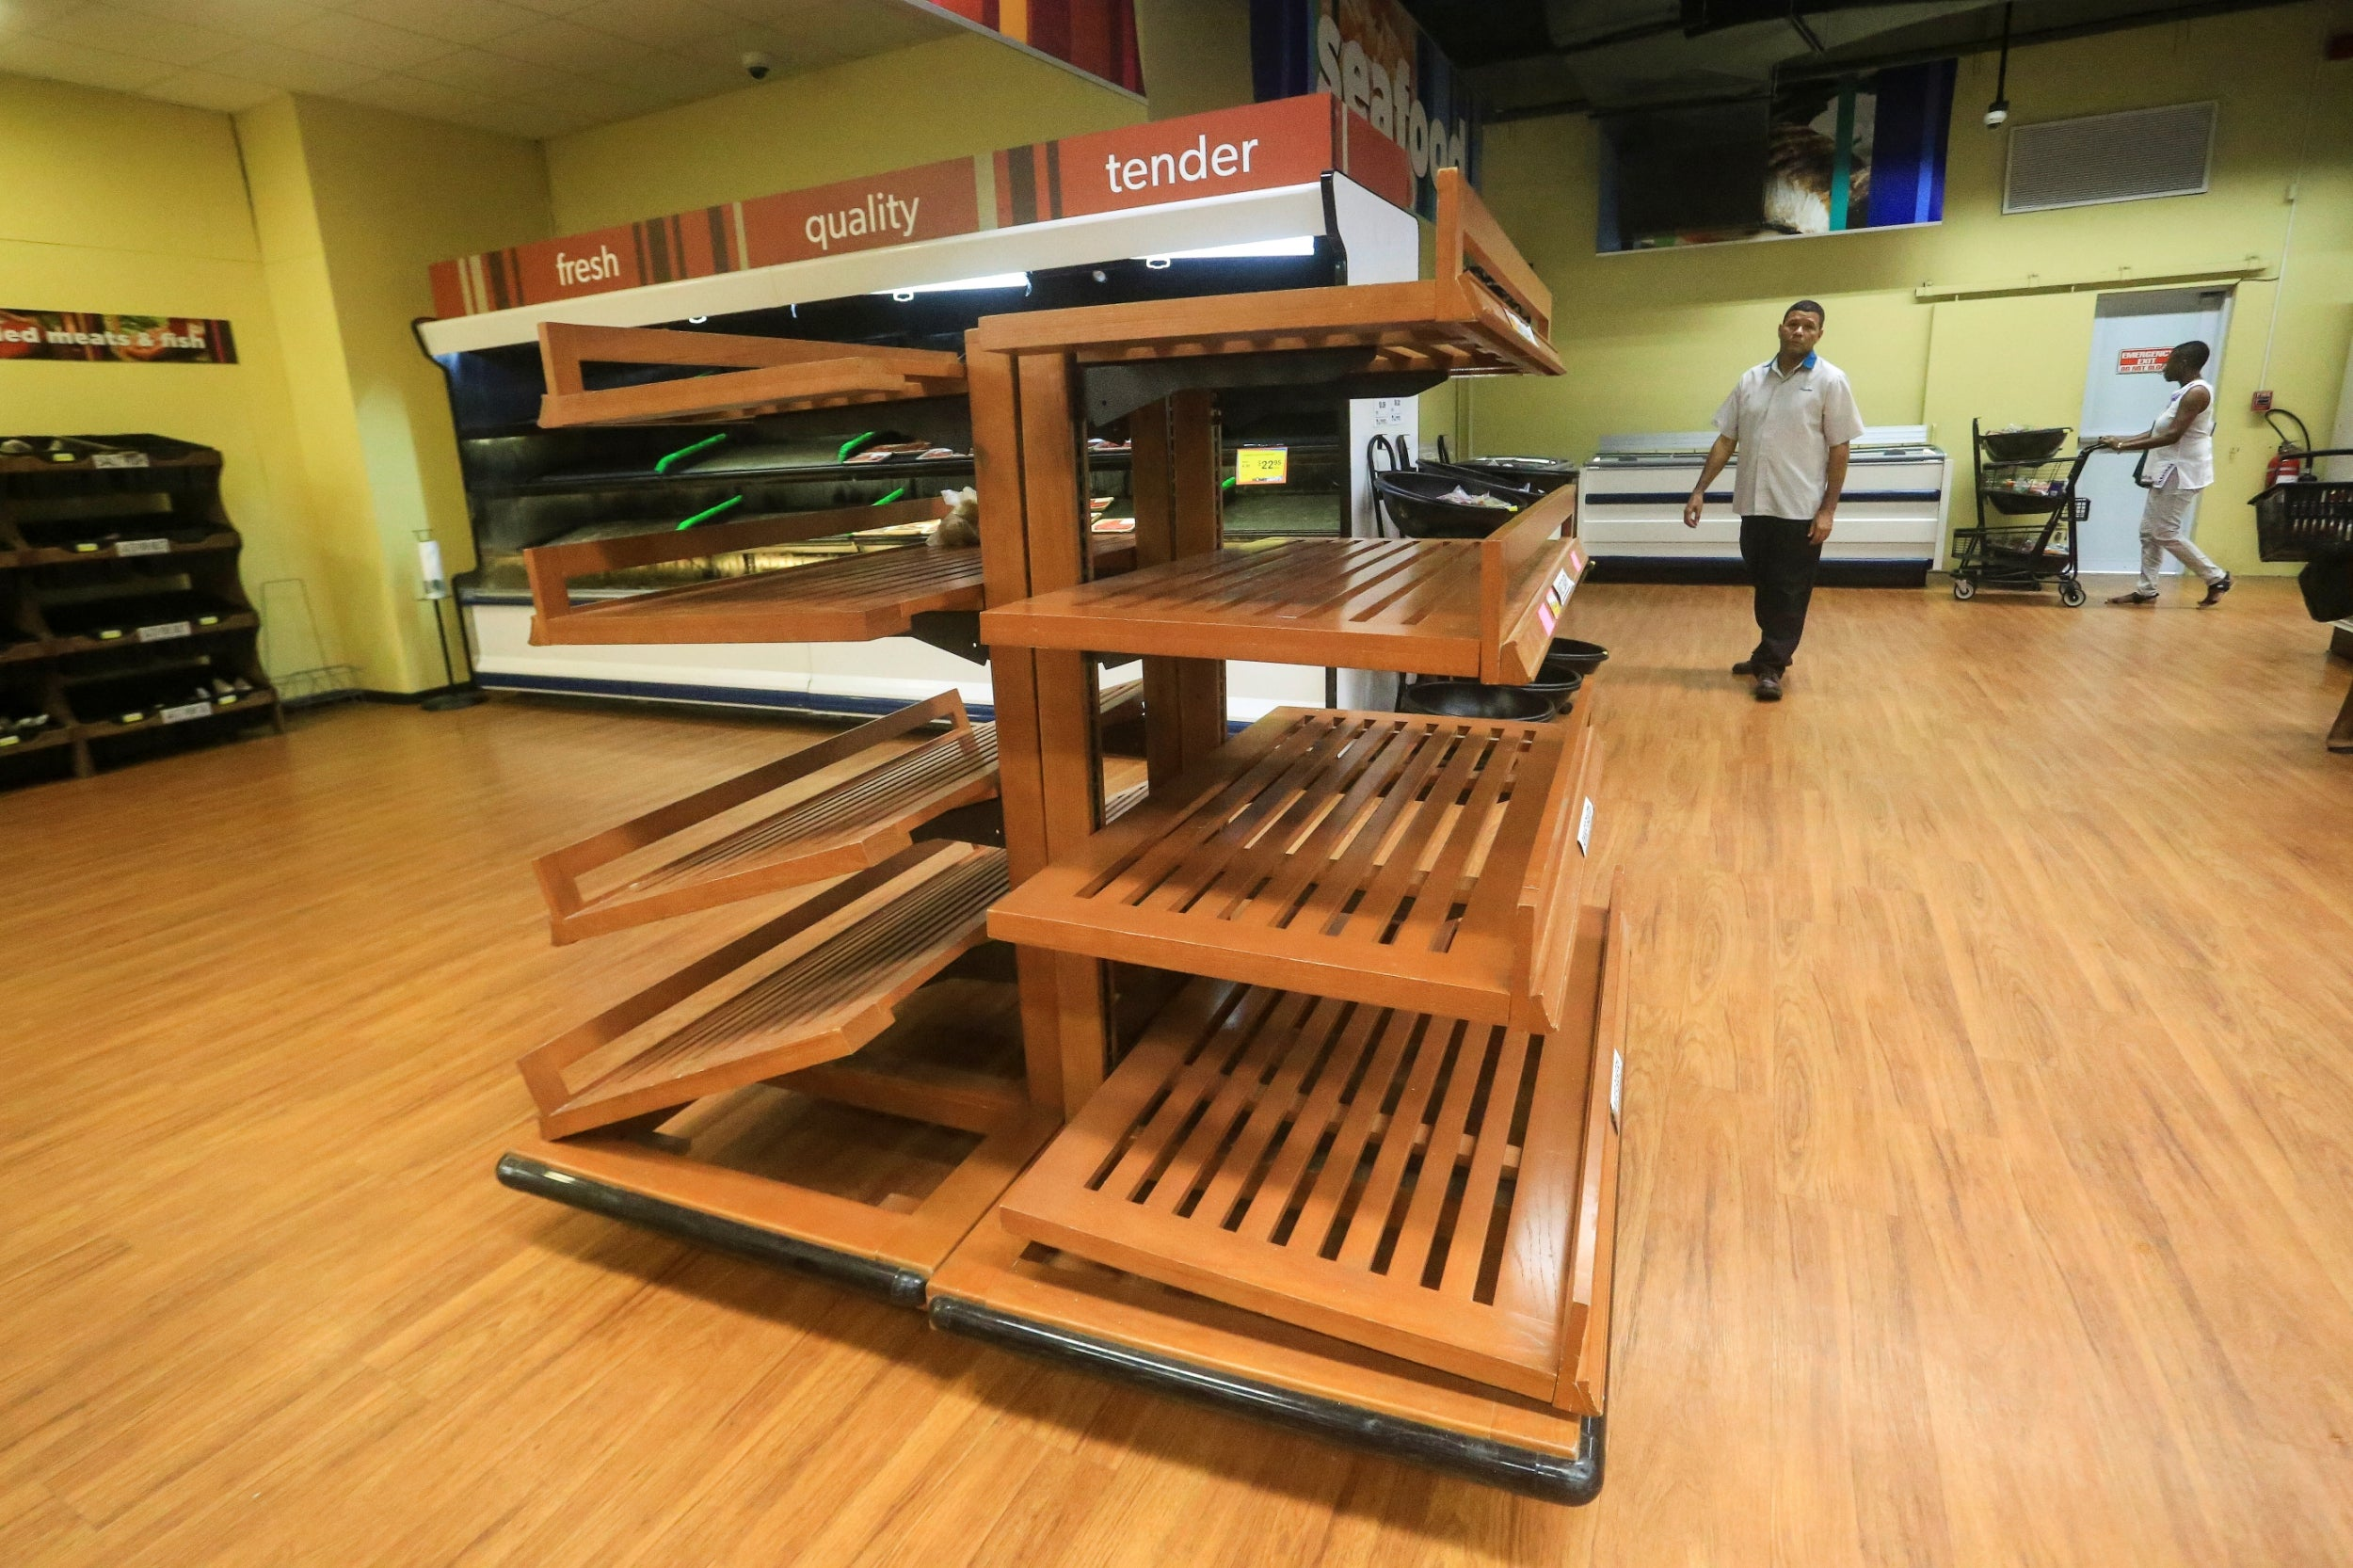 Hurricane Dorian travel advice: Is it safe to visit Florida